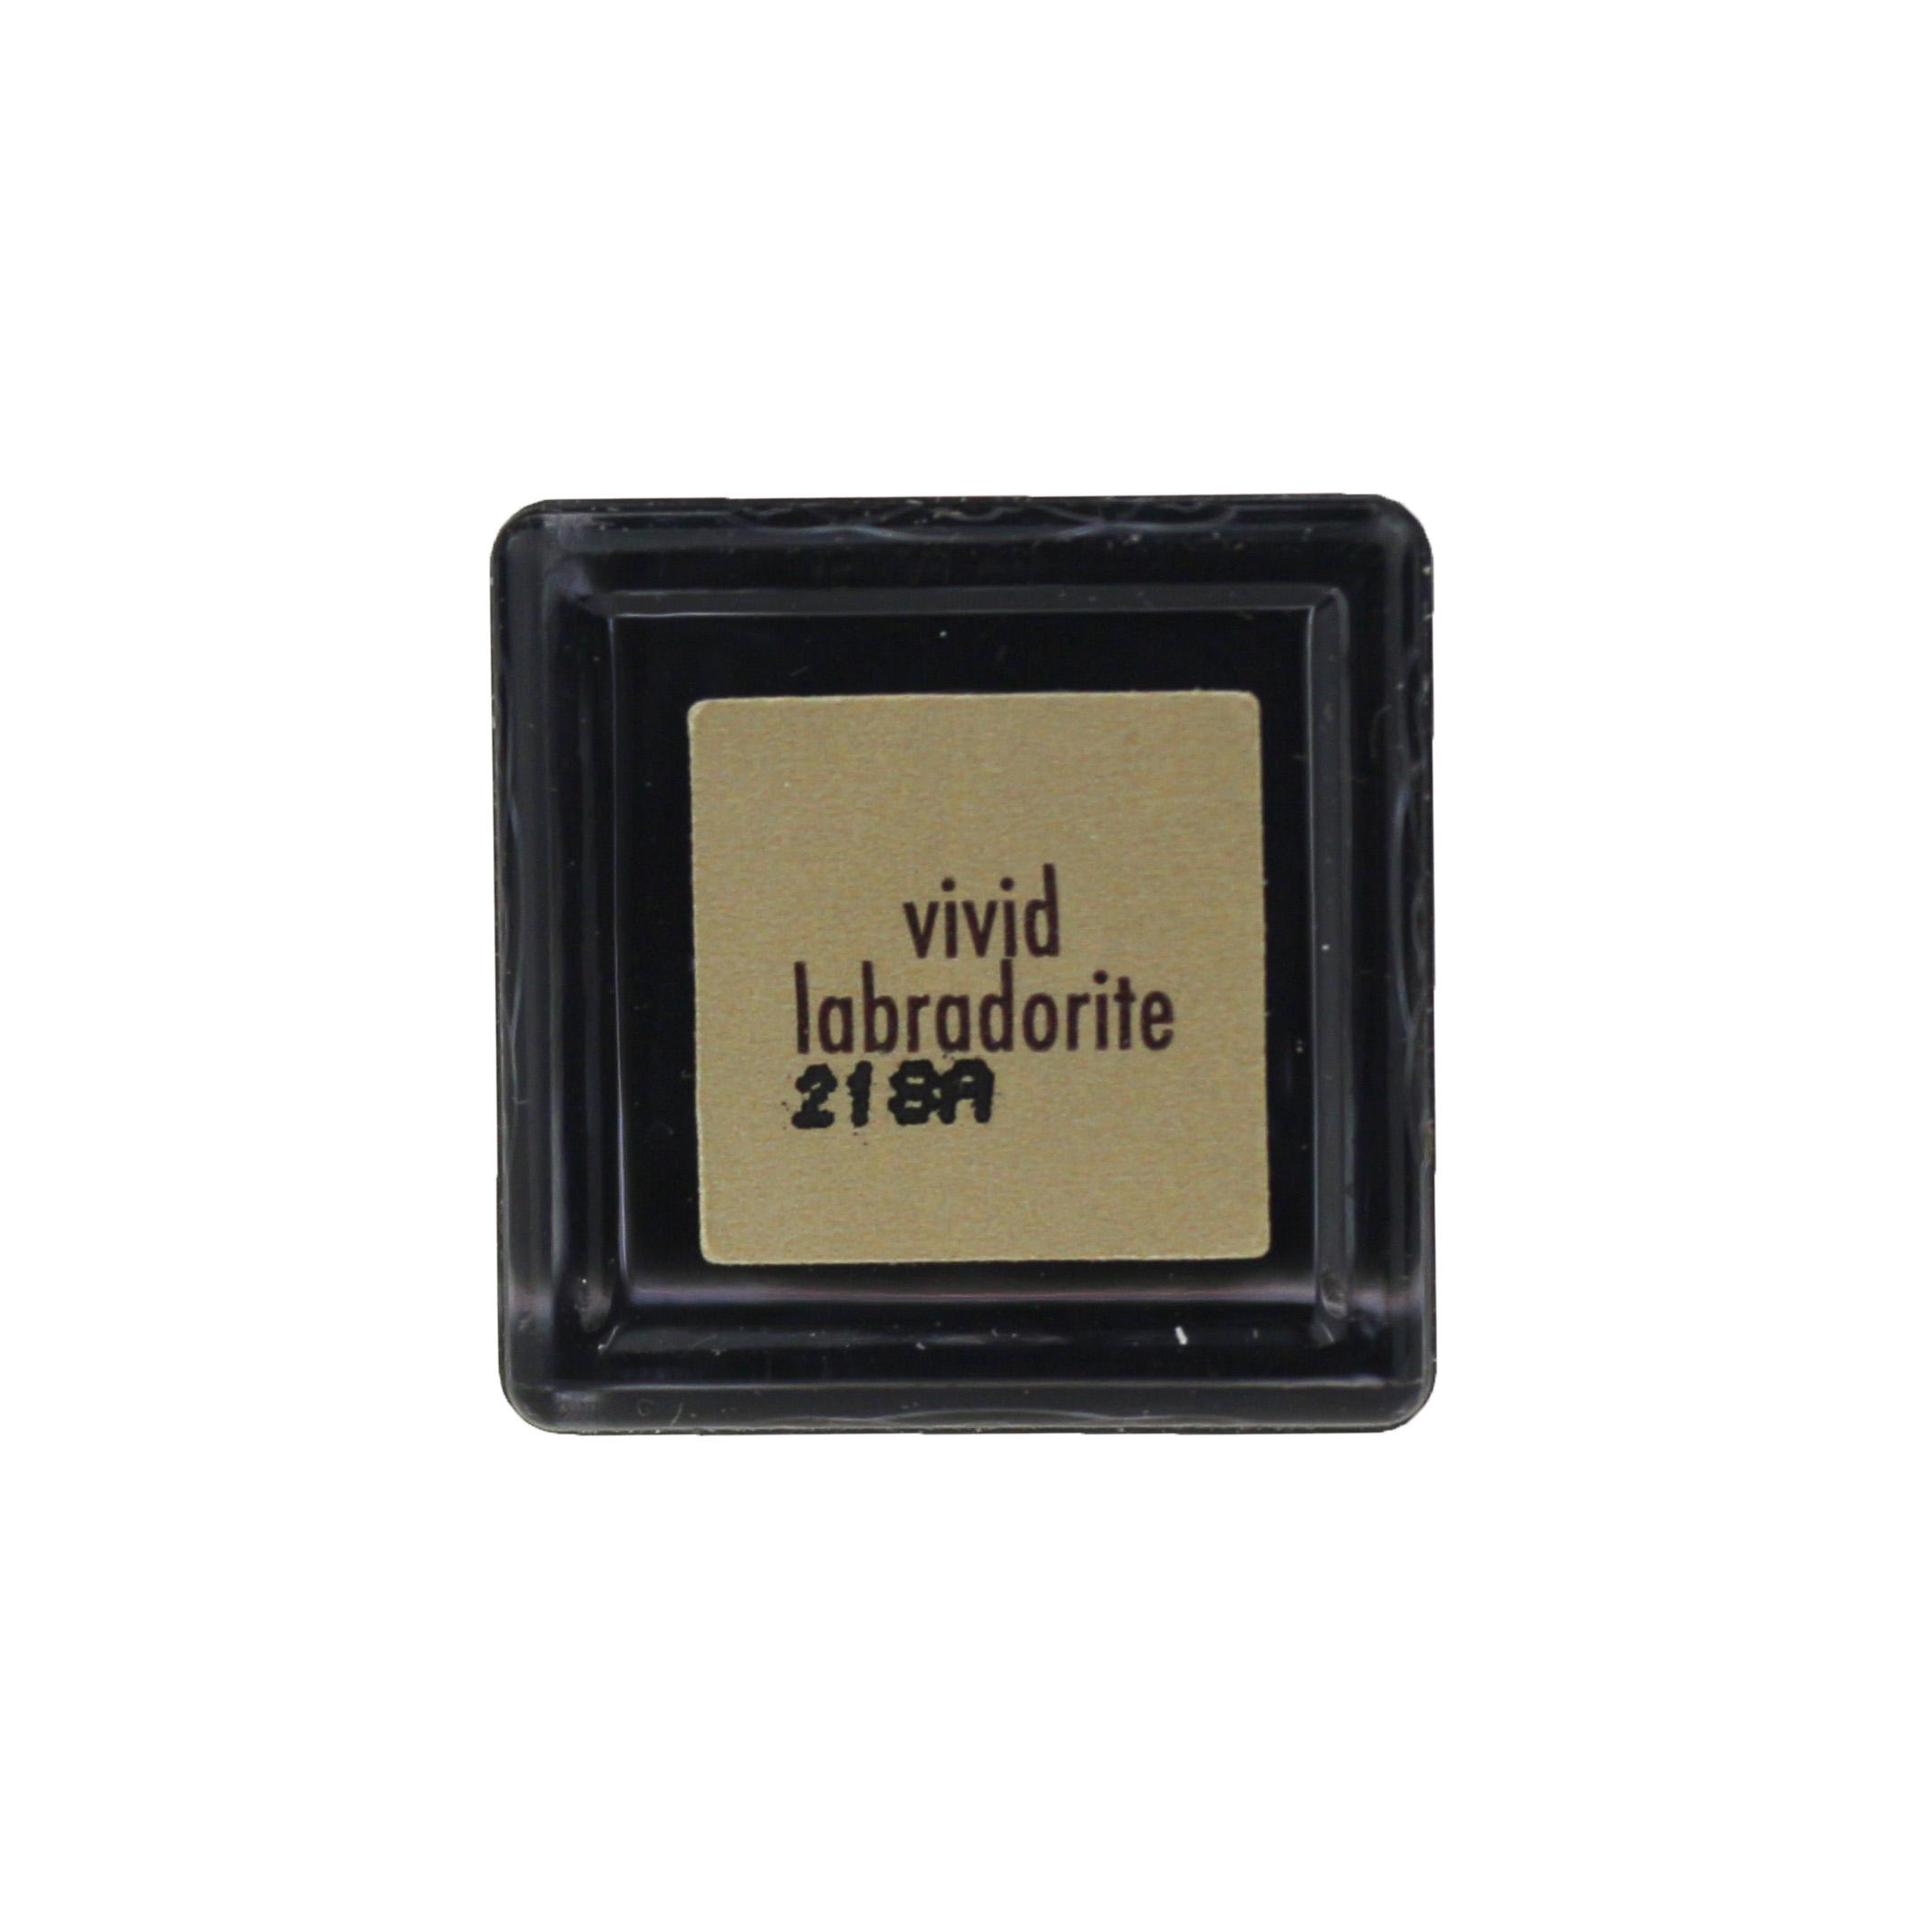 Stila-Shimmer-amp-Glow-Liquid-Eye-Shadow-4-5ml-New-In-Box-Choose-Your-Shade thumbnail 21